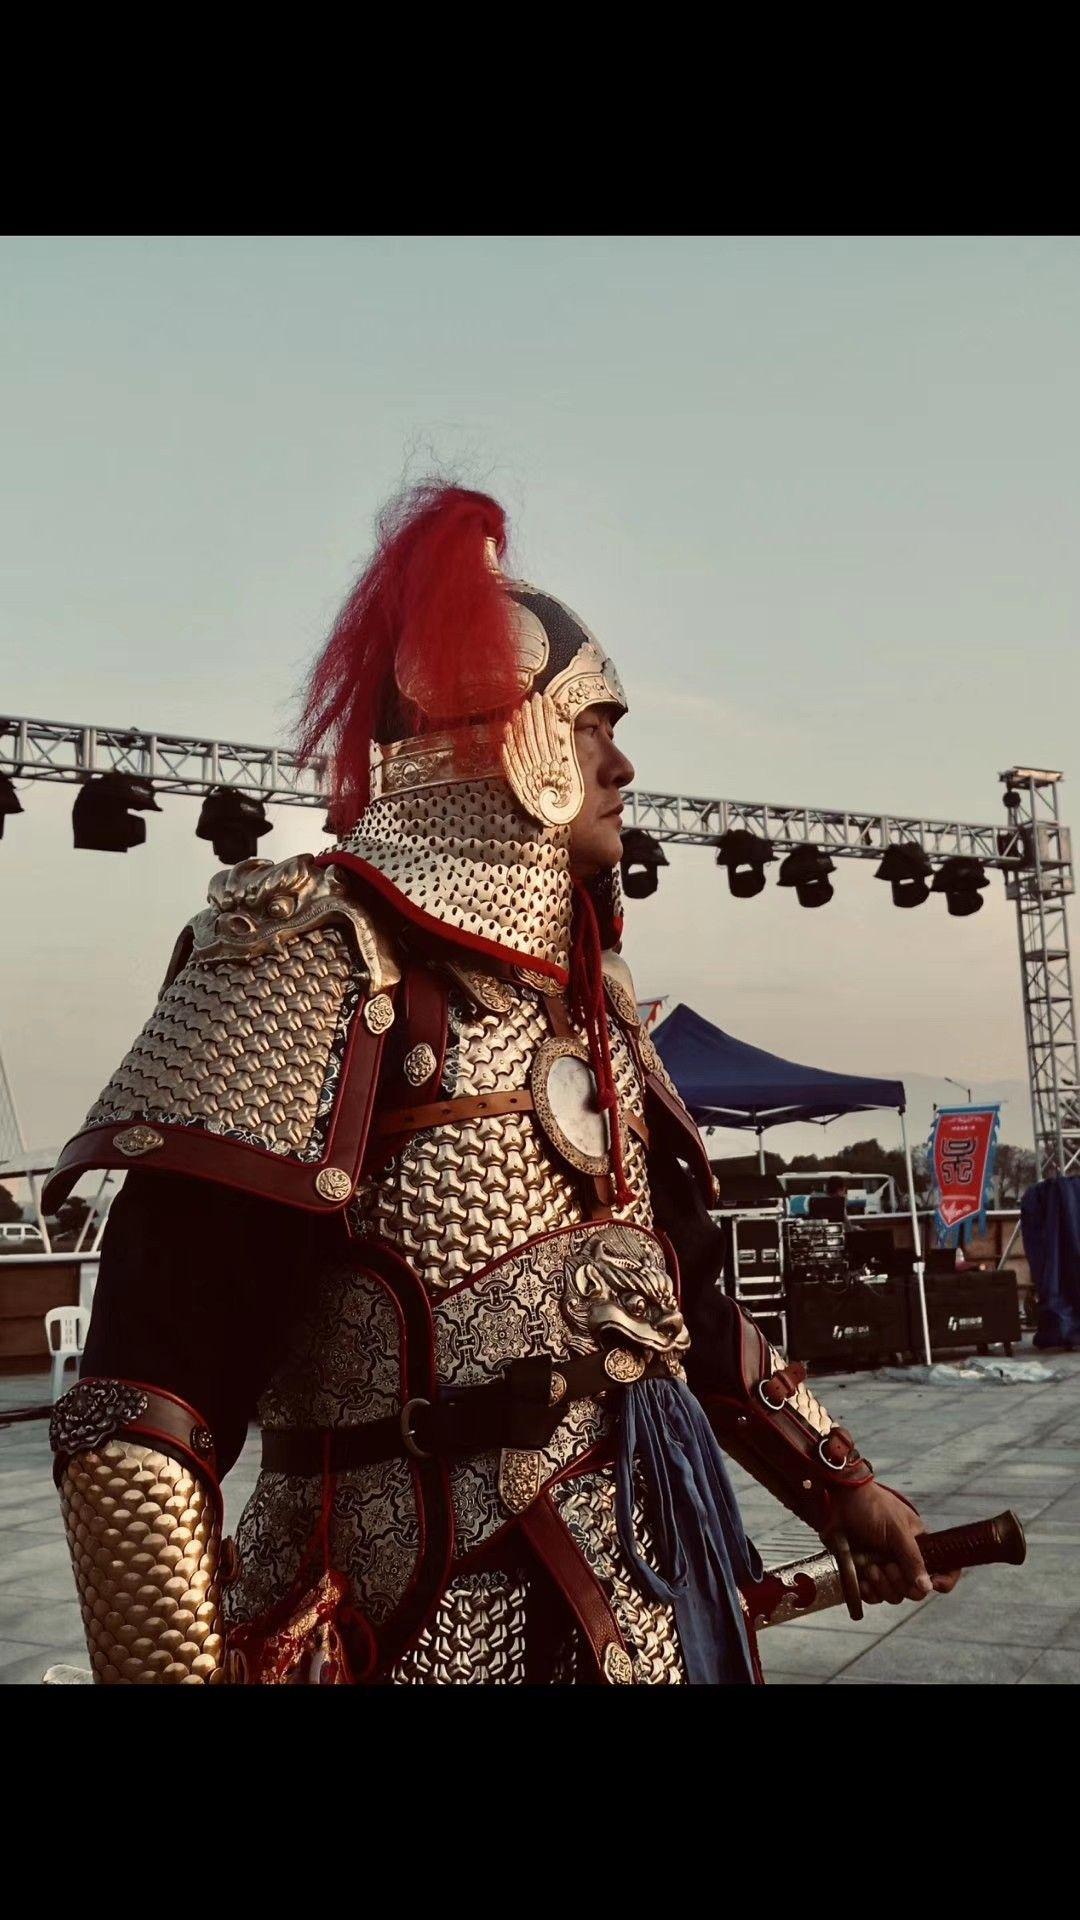 Ming Warriors